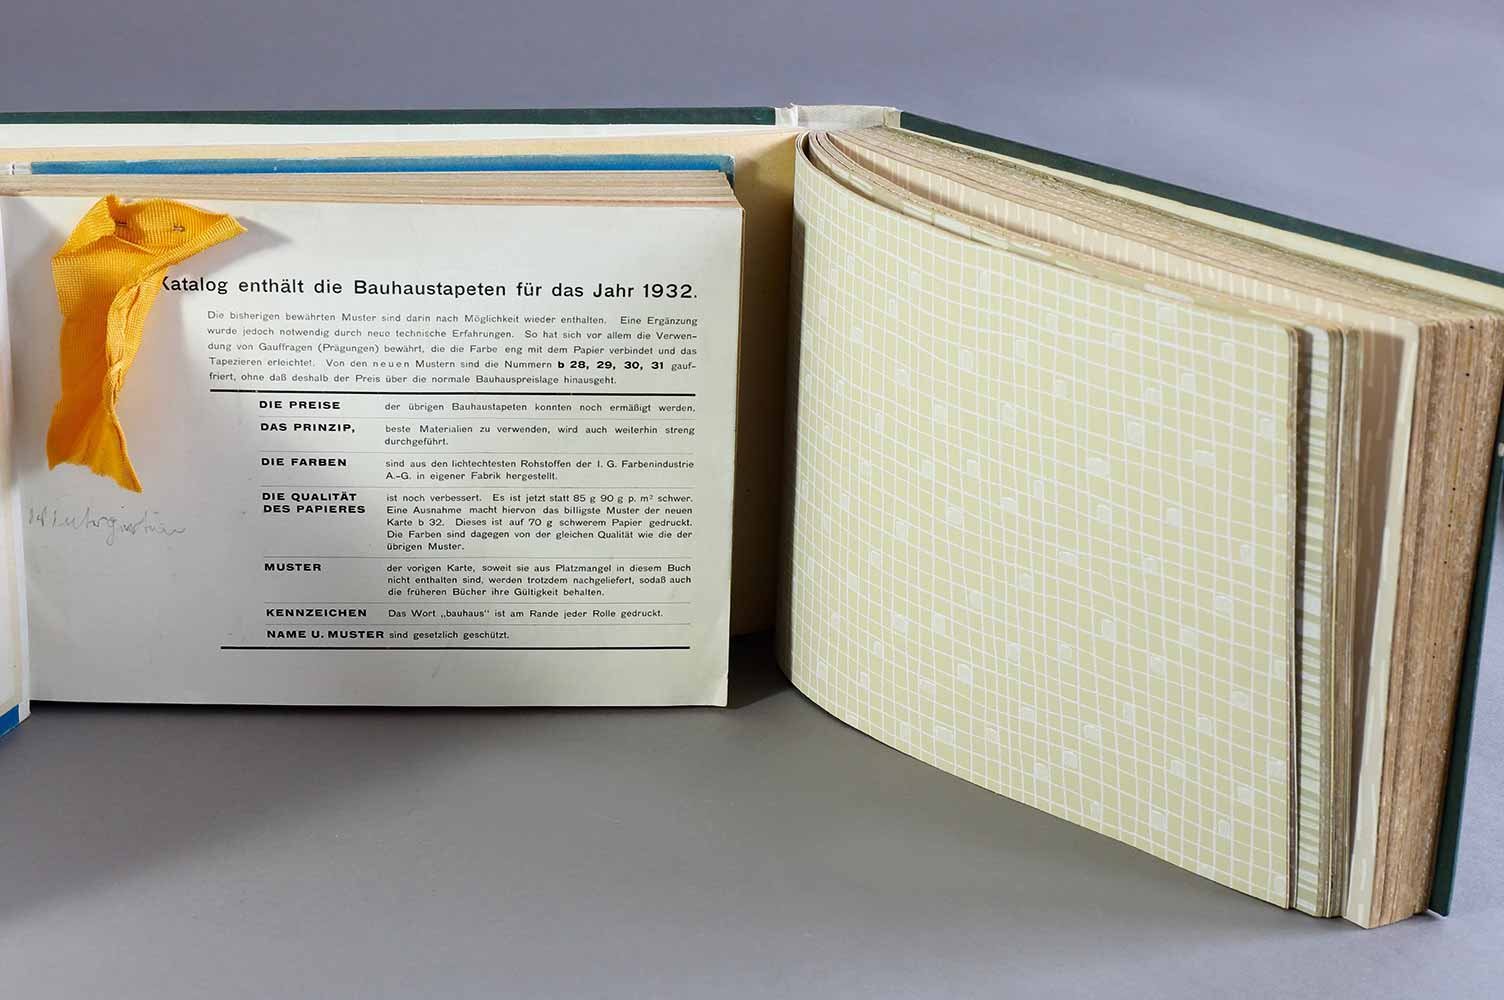 Lot 360 - Rasch2 Bauhaus wallpaper pattern books, 1932 and anniversary issue 1956, Tapetenmusterbücher1932 and